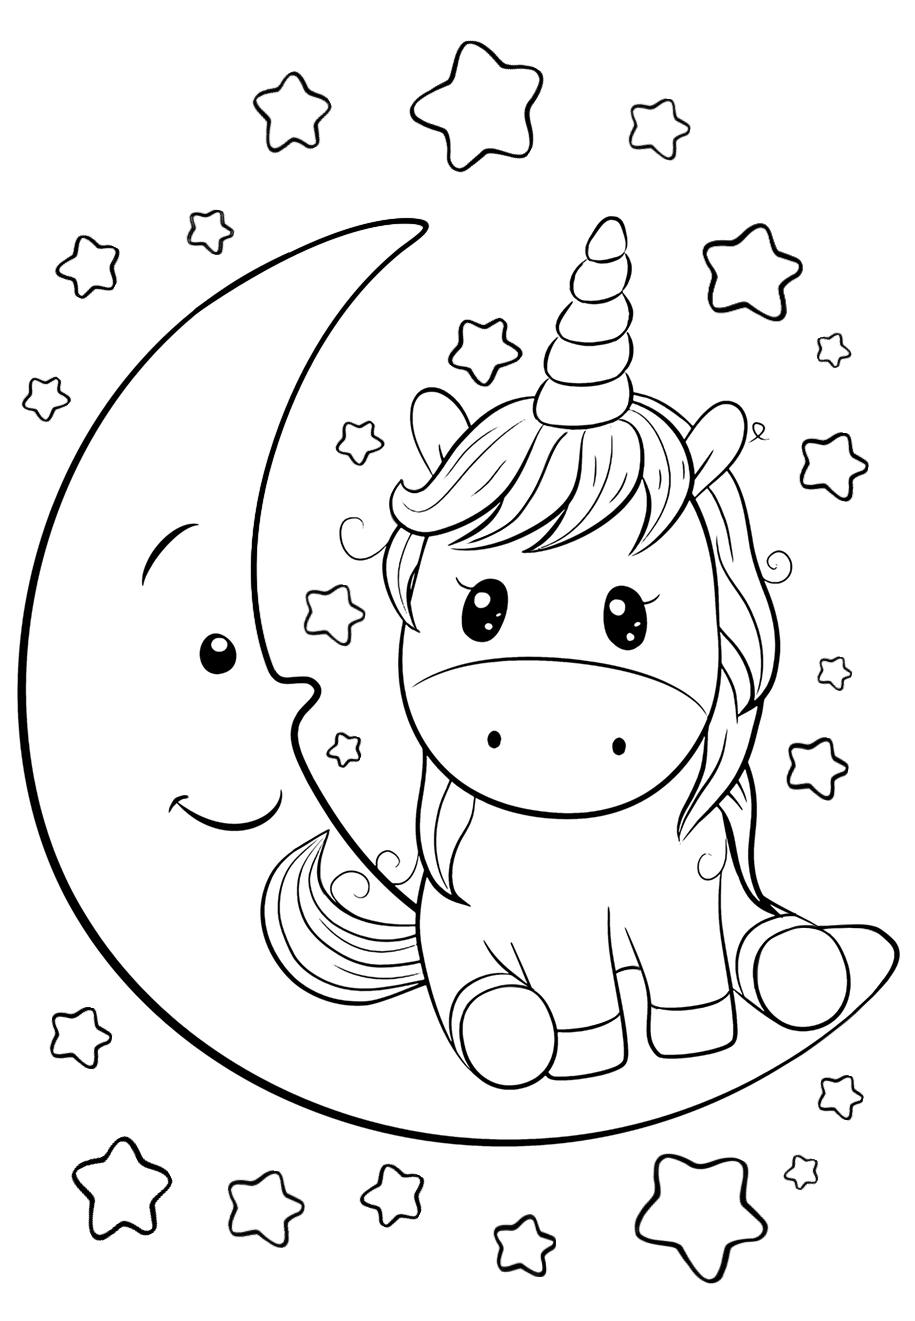 Cute Unicorn on the moon